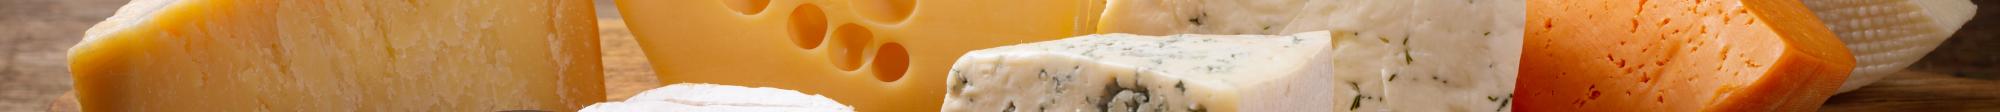 Comprar  quesos Otras variedades   Mixtura Gourmet